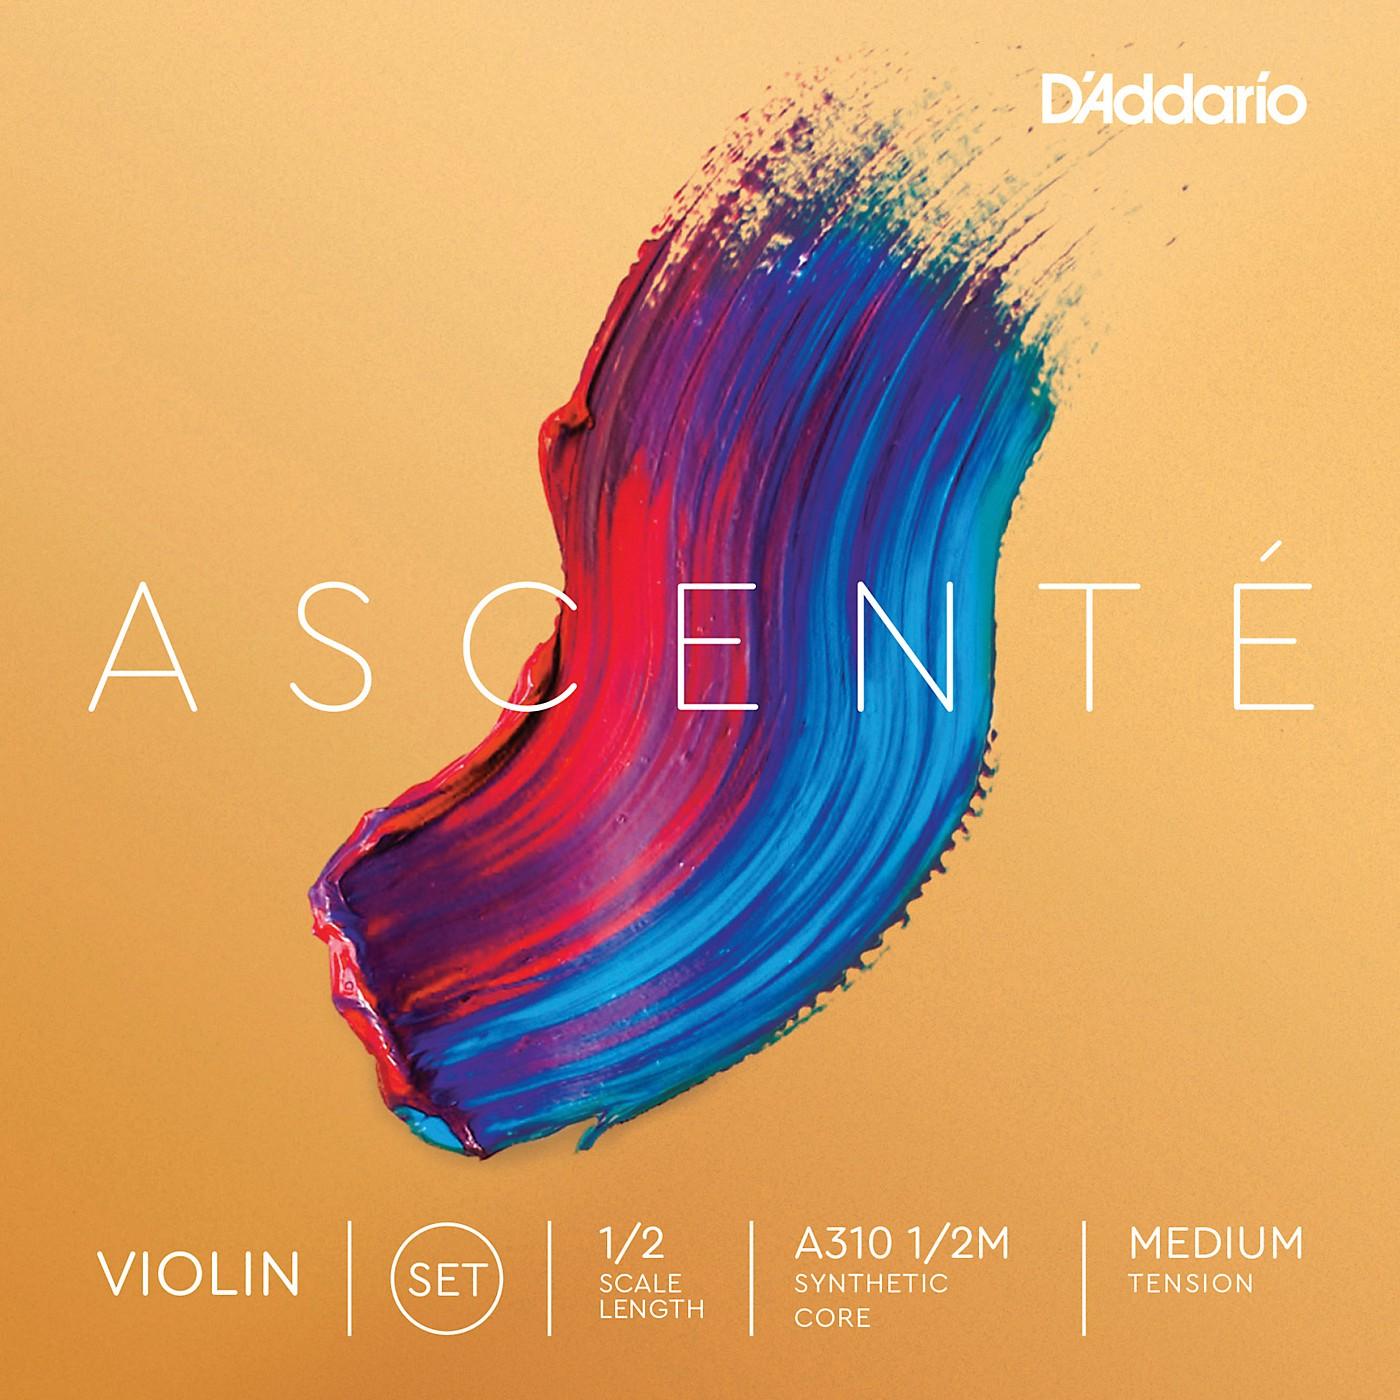 D'Addario Ascente Violin String Set thumbnail